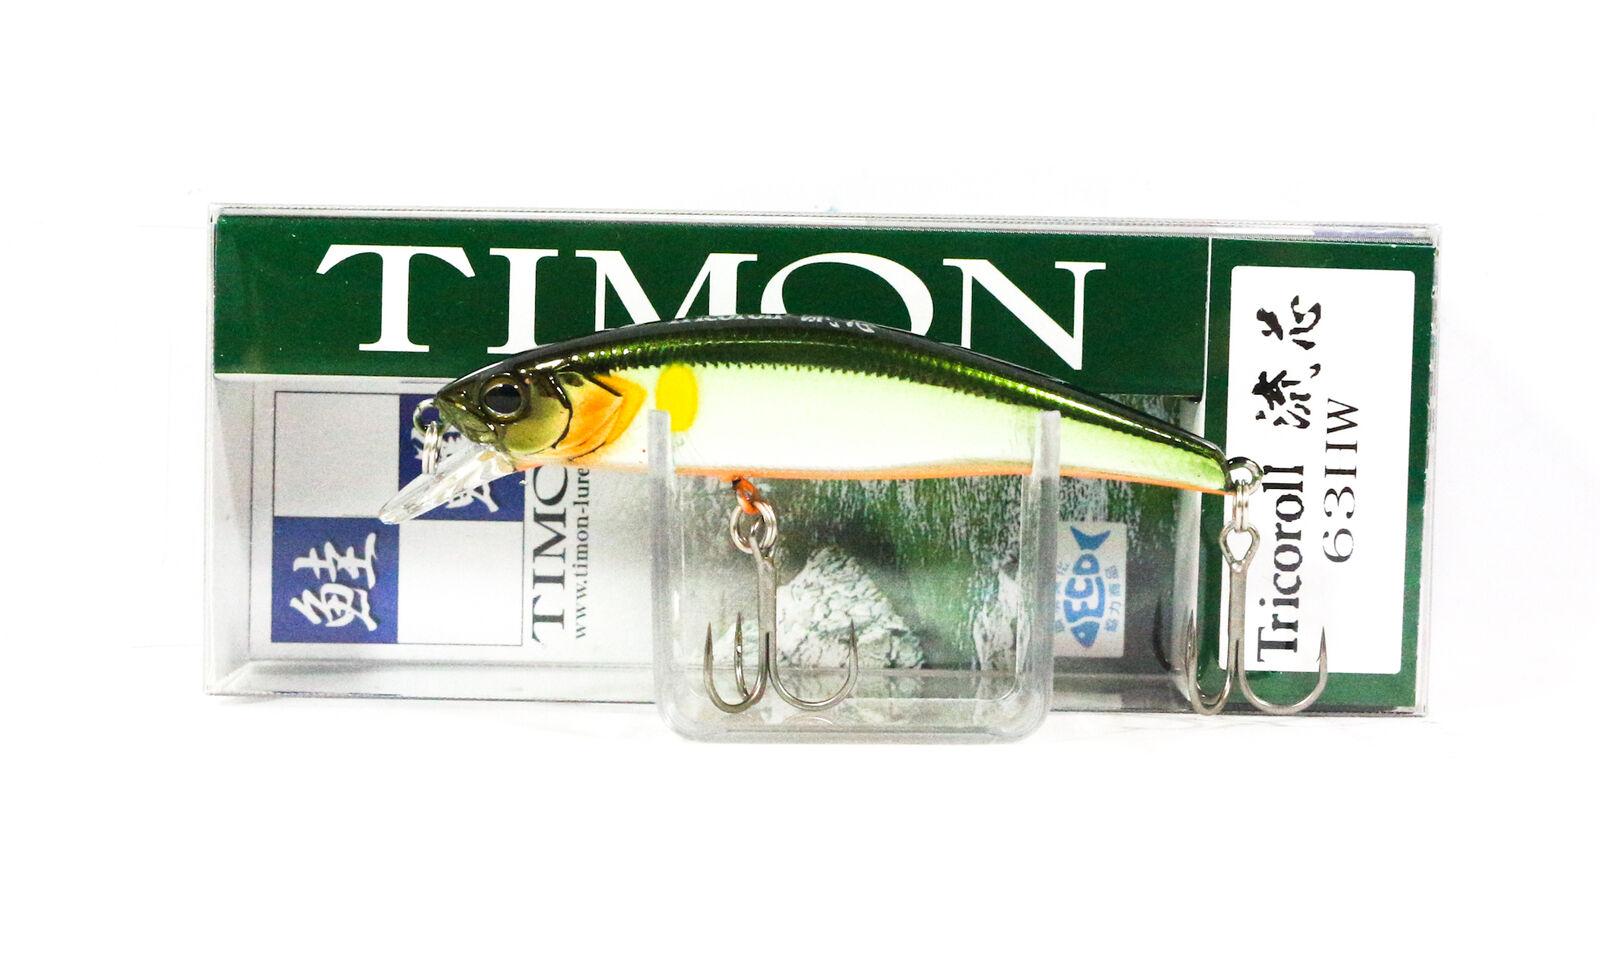 Jackall Timon Tricoroll 67F fishing lures original range of colors